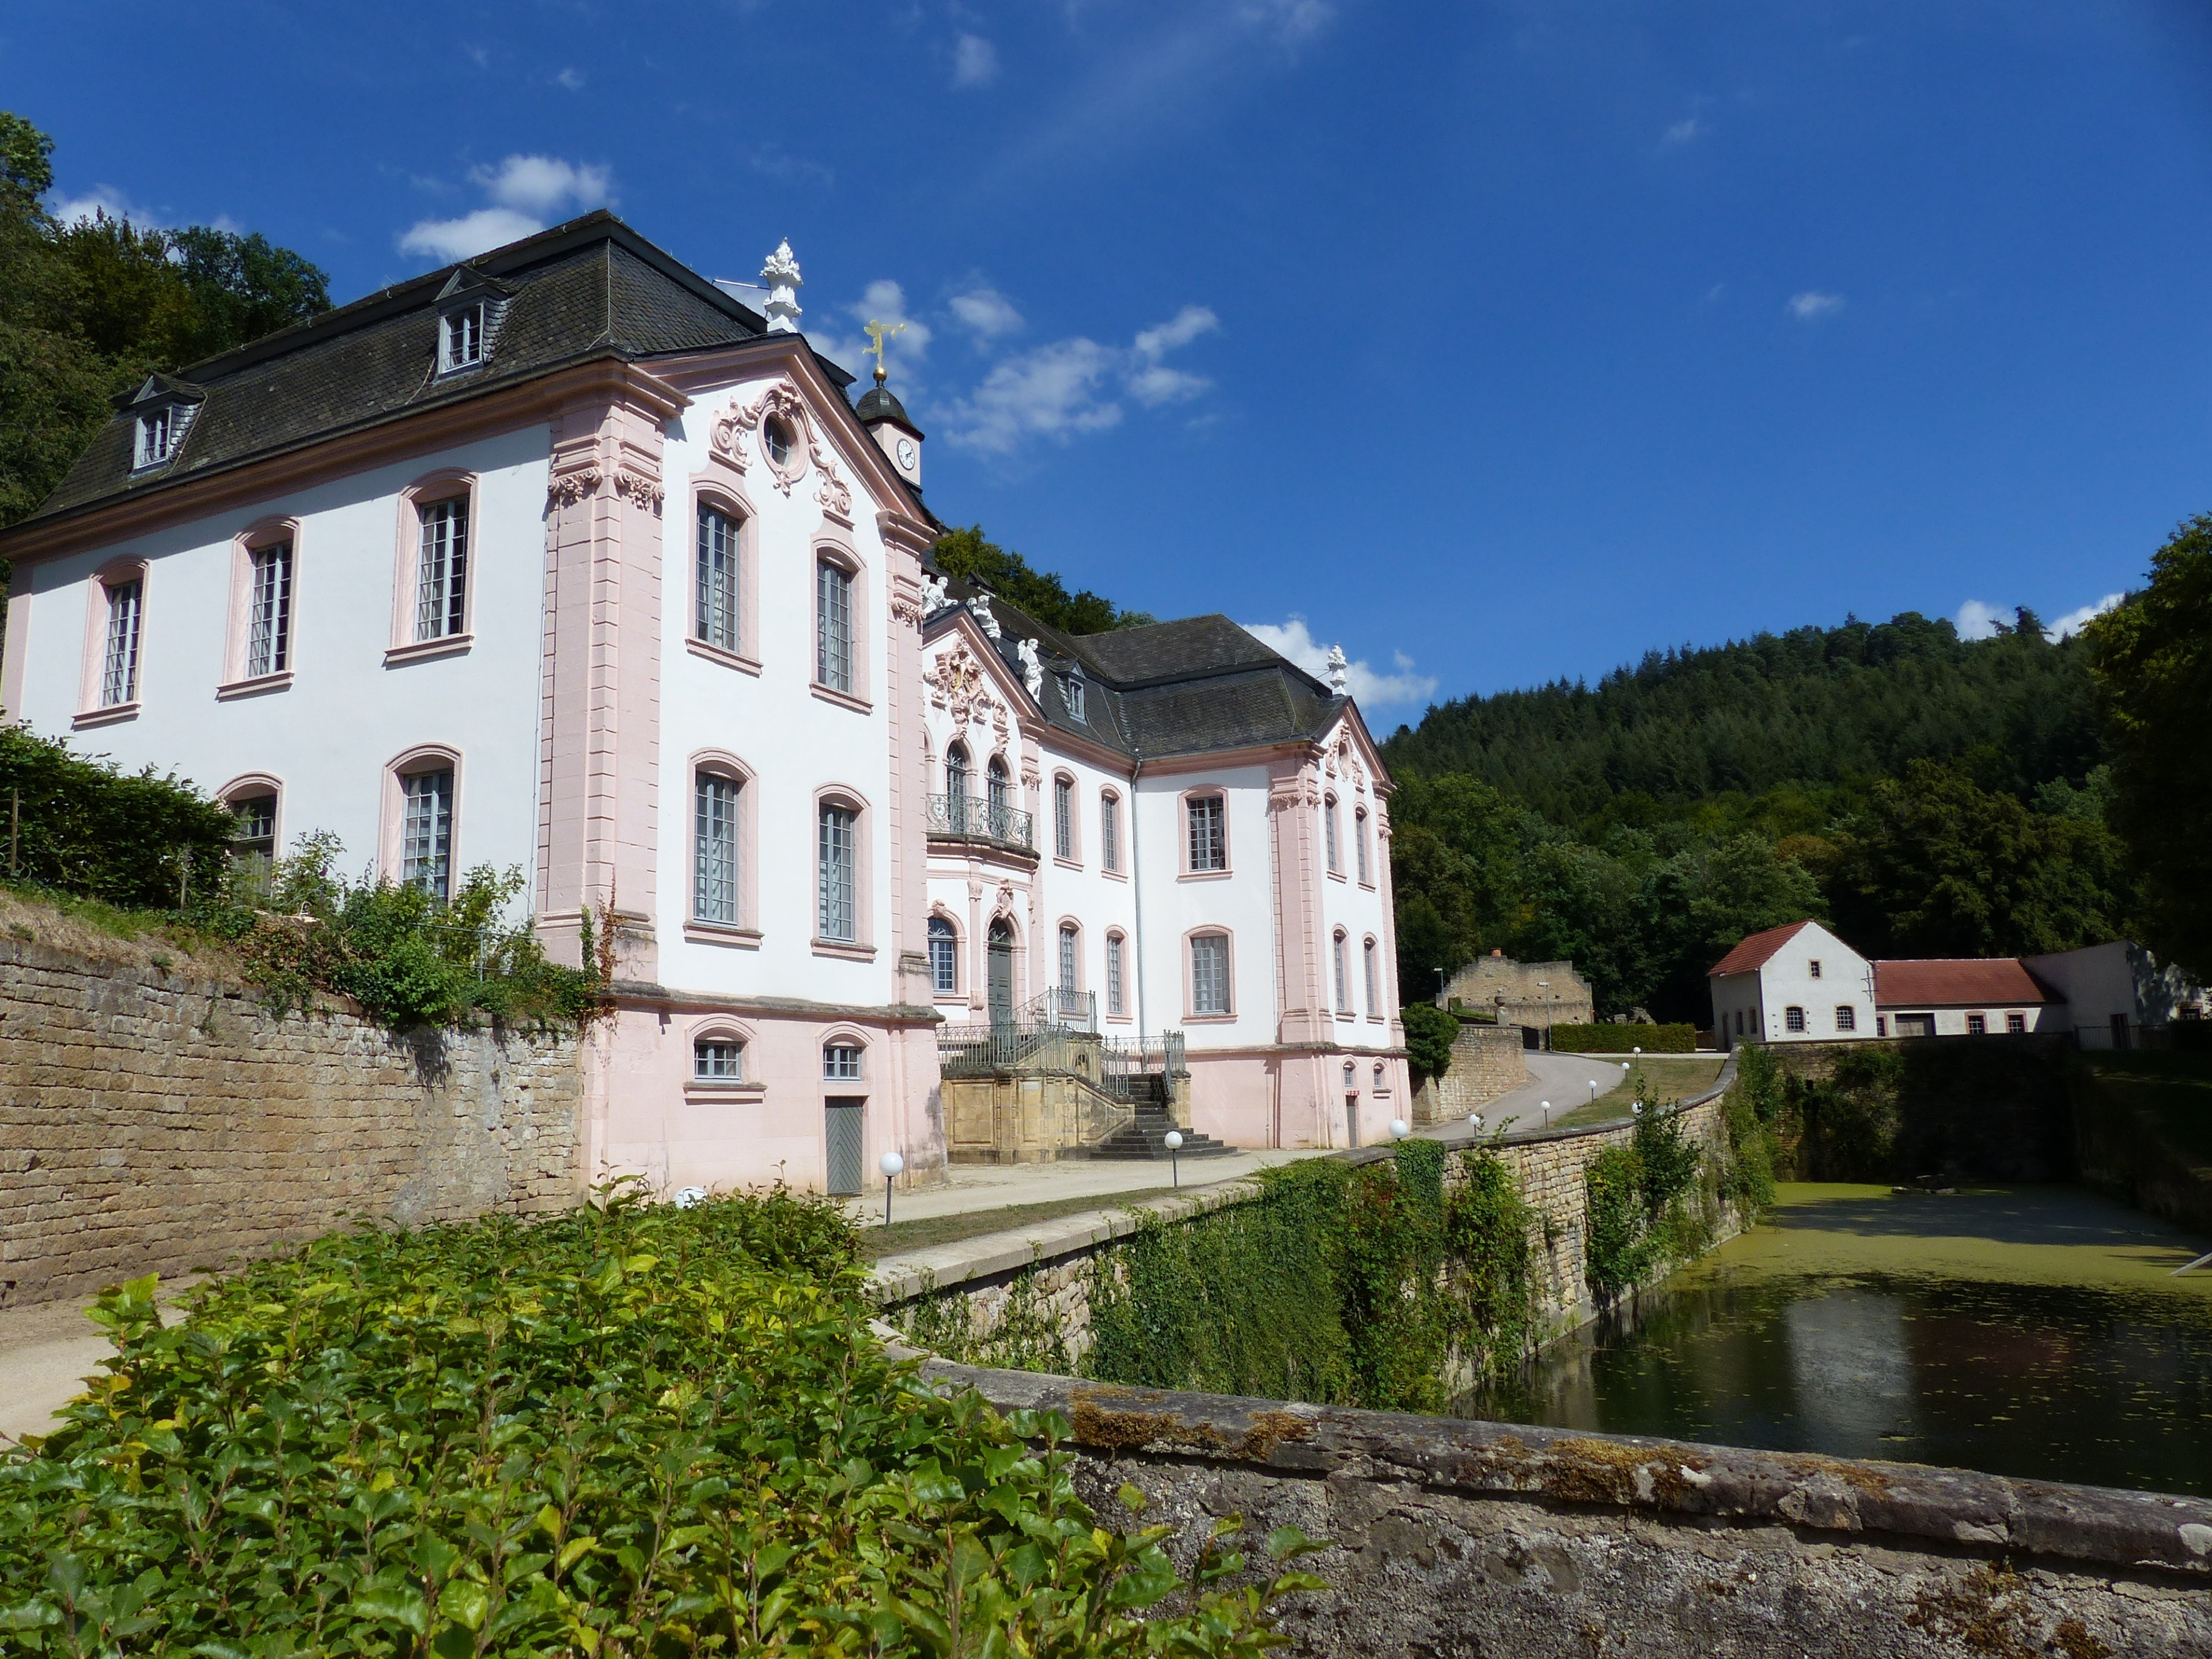 Bollendorf, Rhineland-Palatinate, Germany